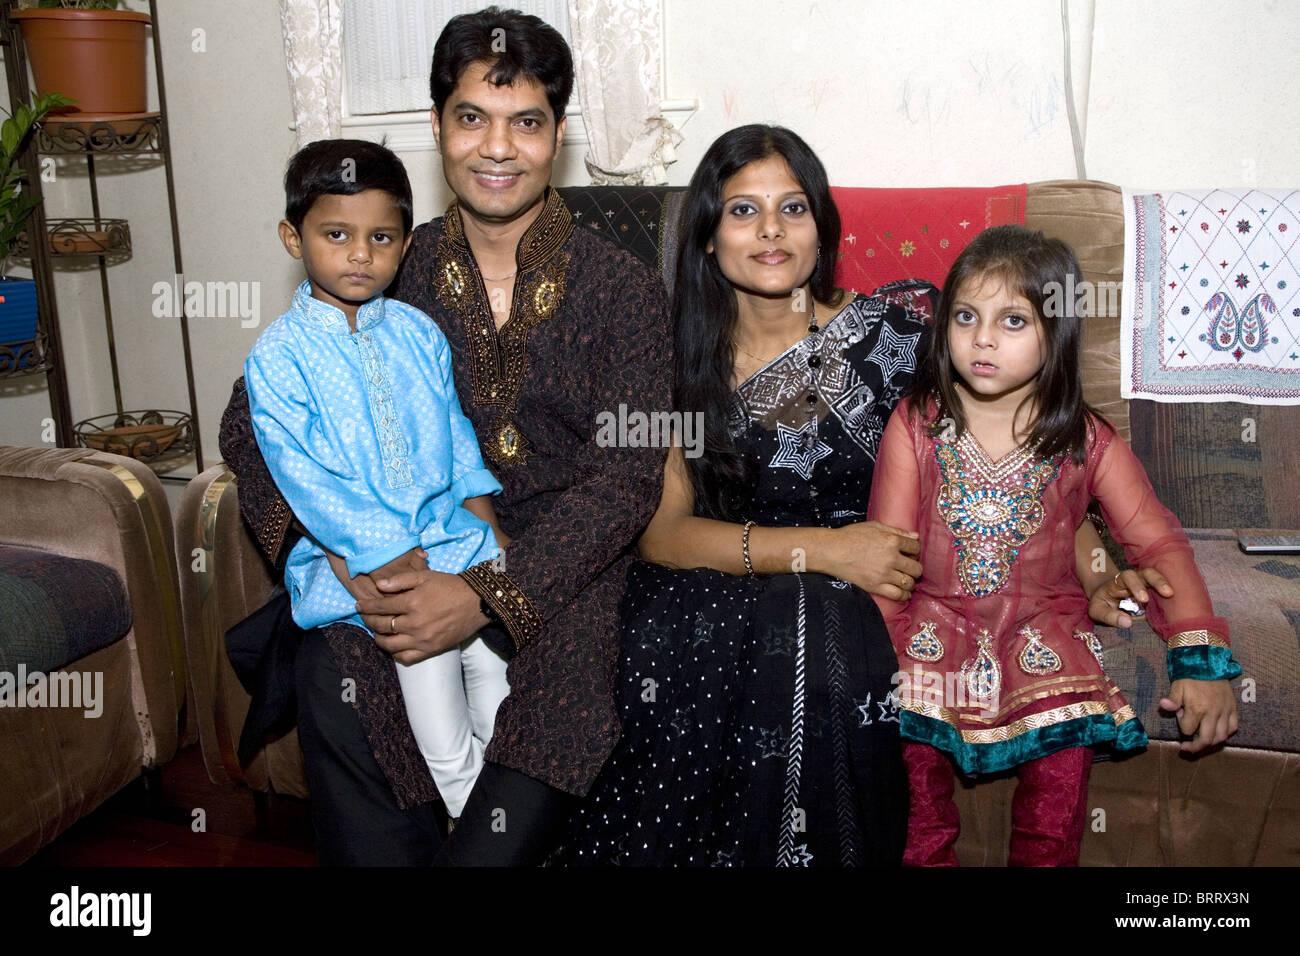 Bangladeshi American Muslim family on the holiday Eid marking the end of Ramadan in Brooklyn, New York. Portrait - Stock Image